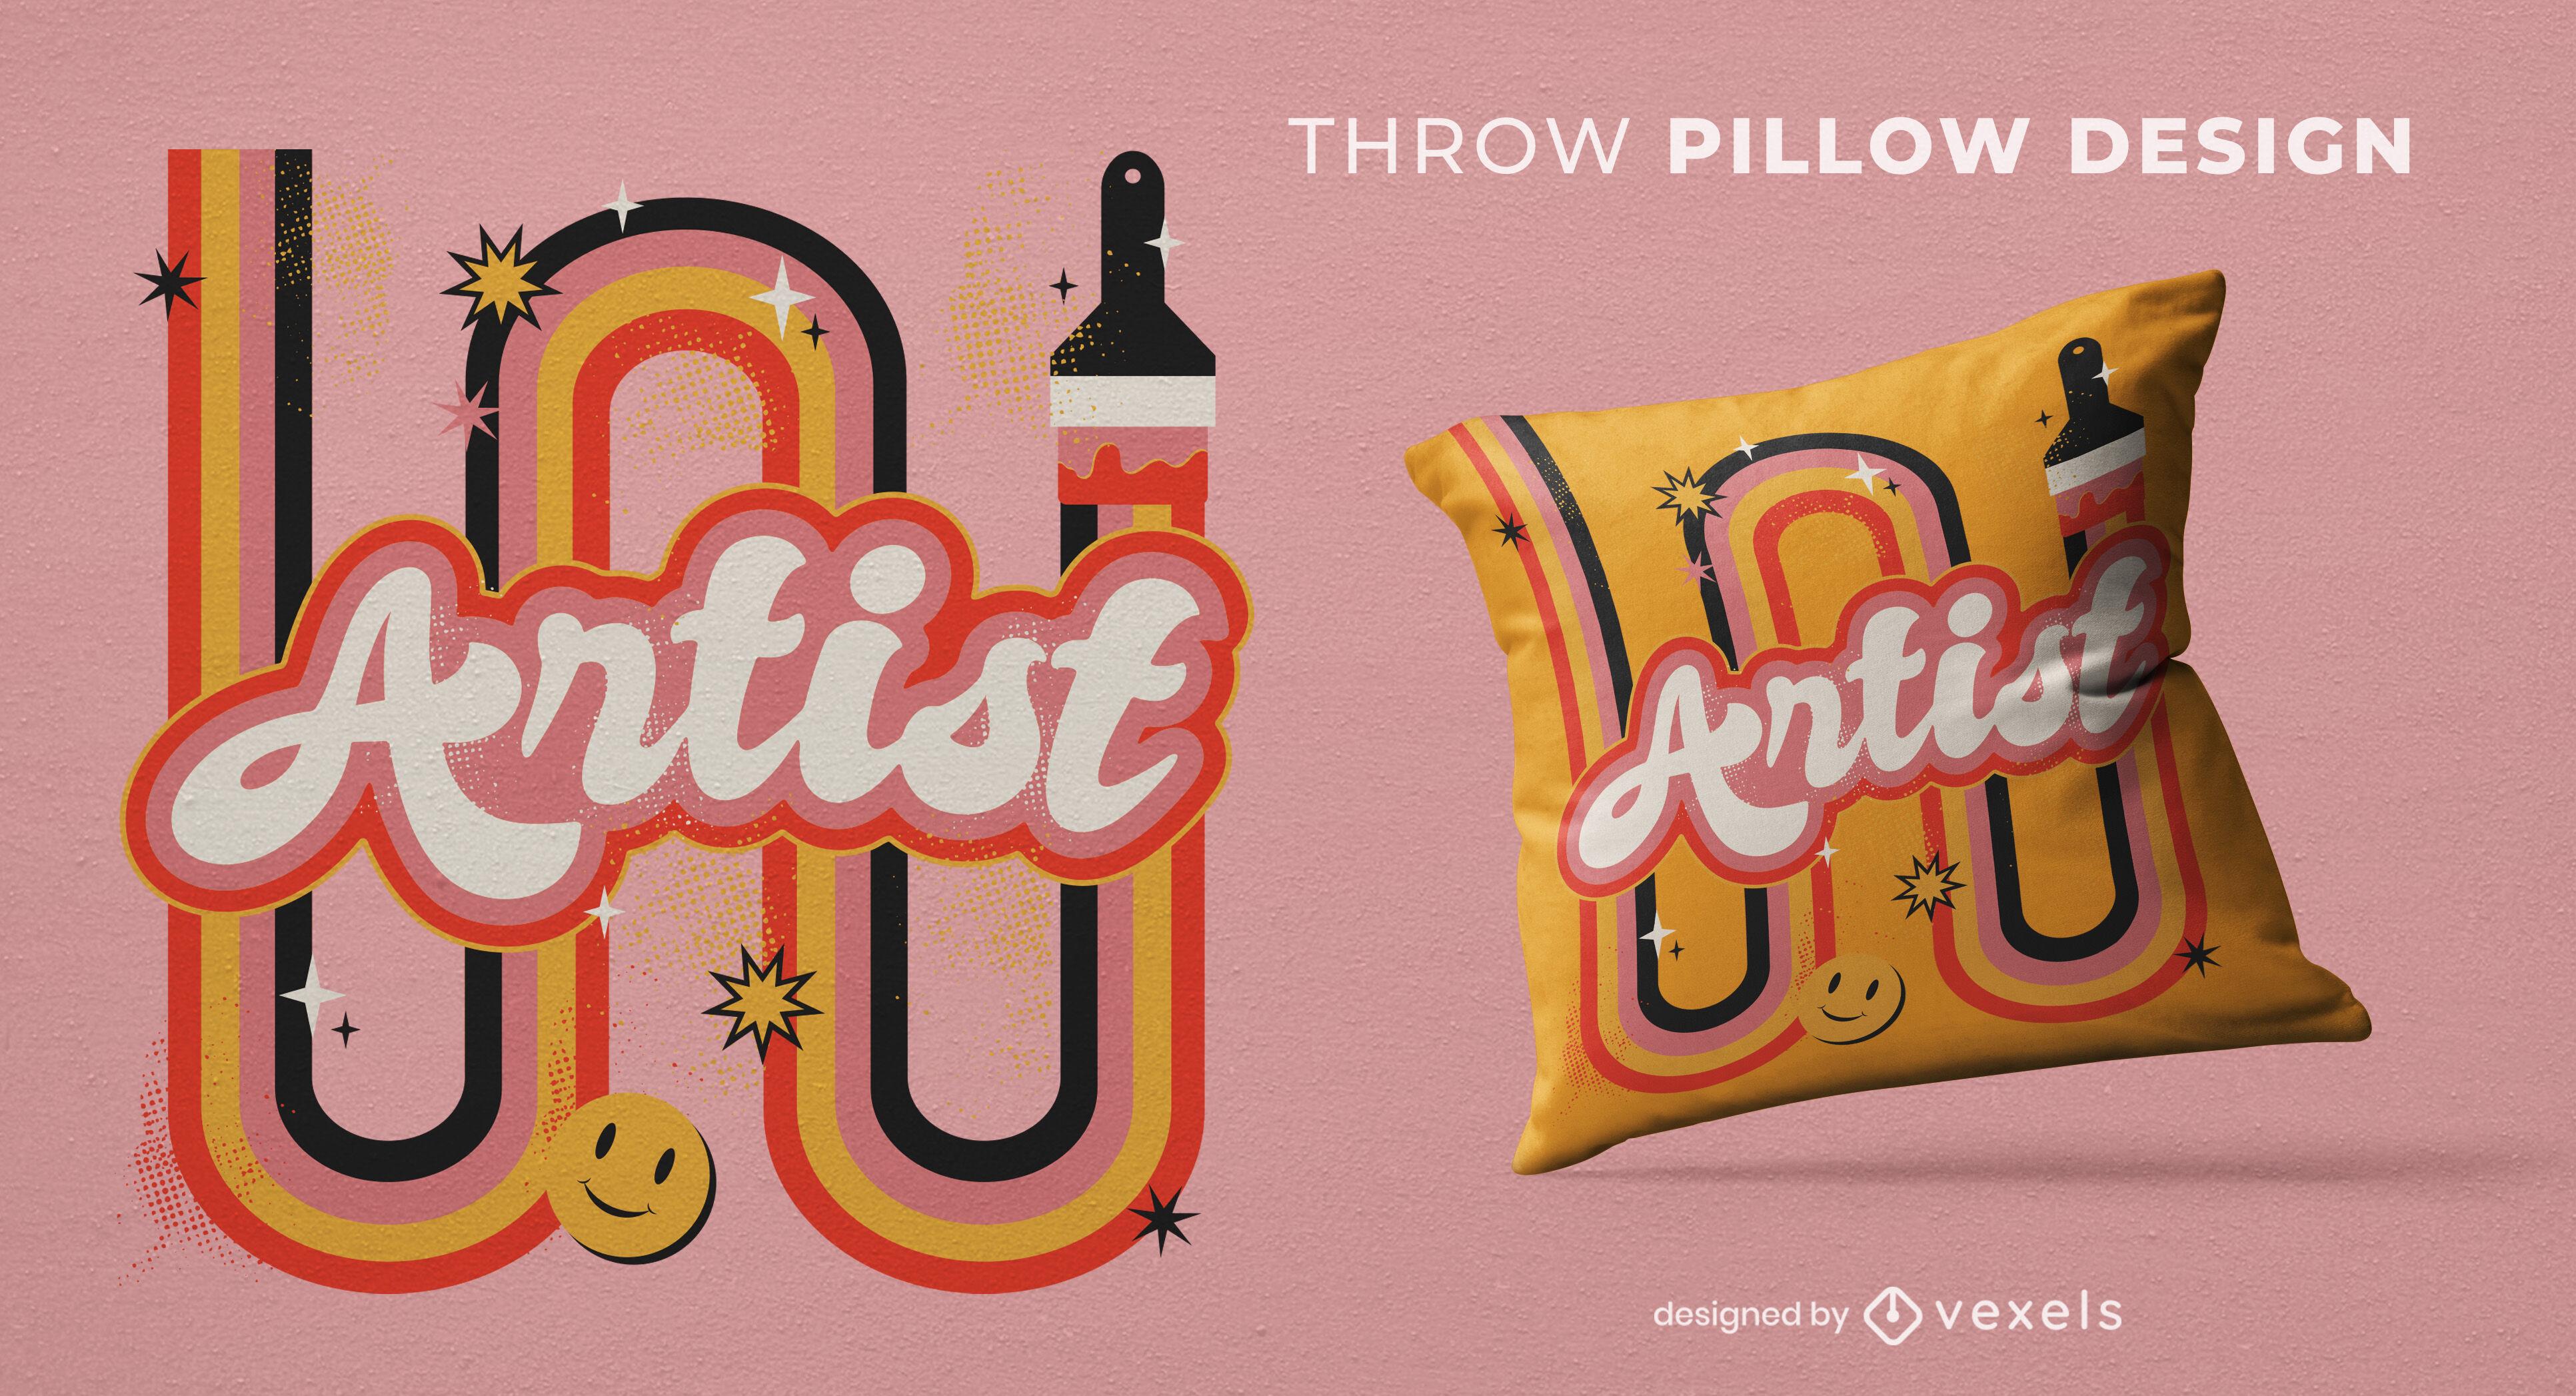 Cool artistic throw pillow design